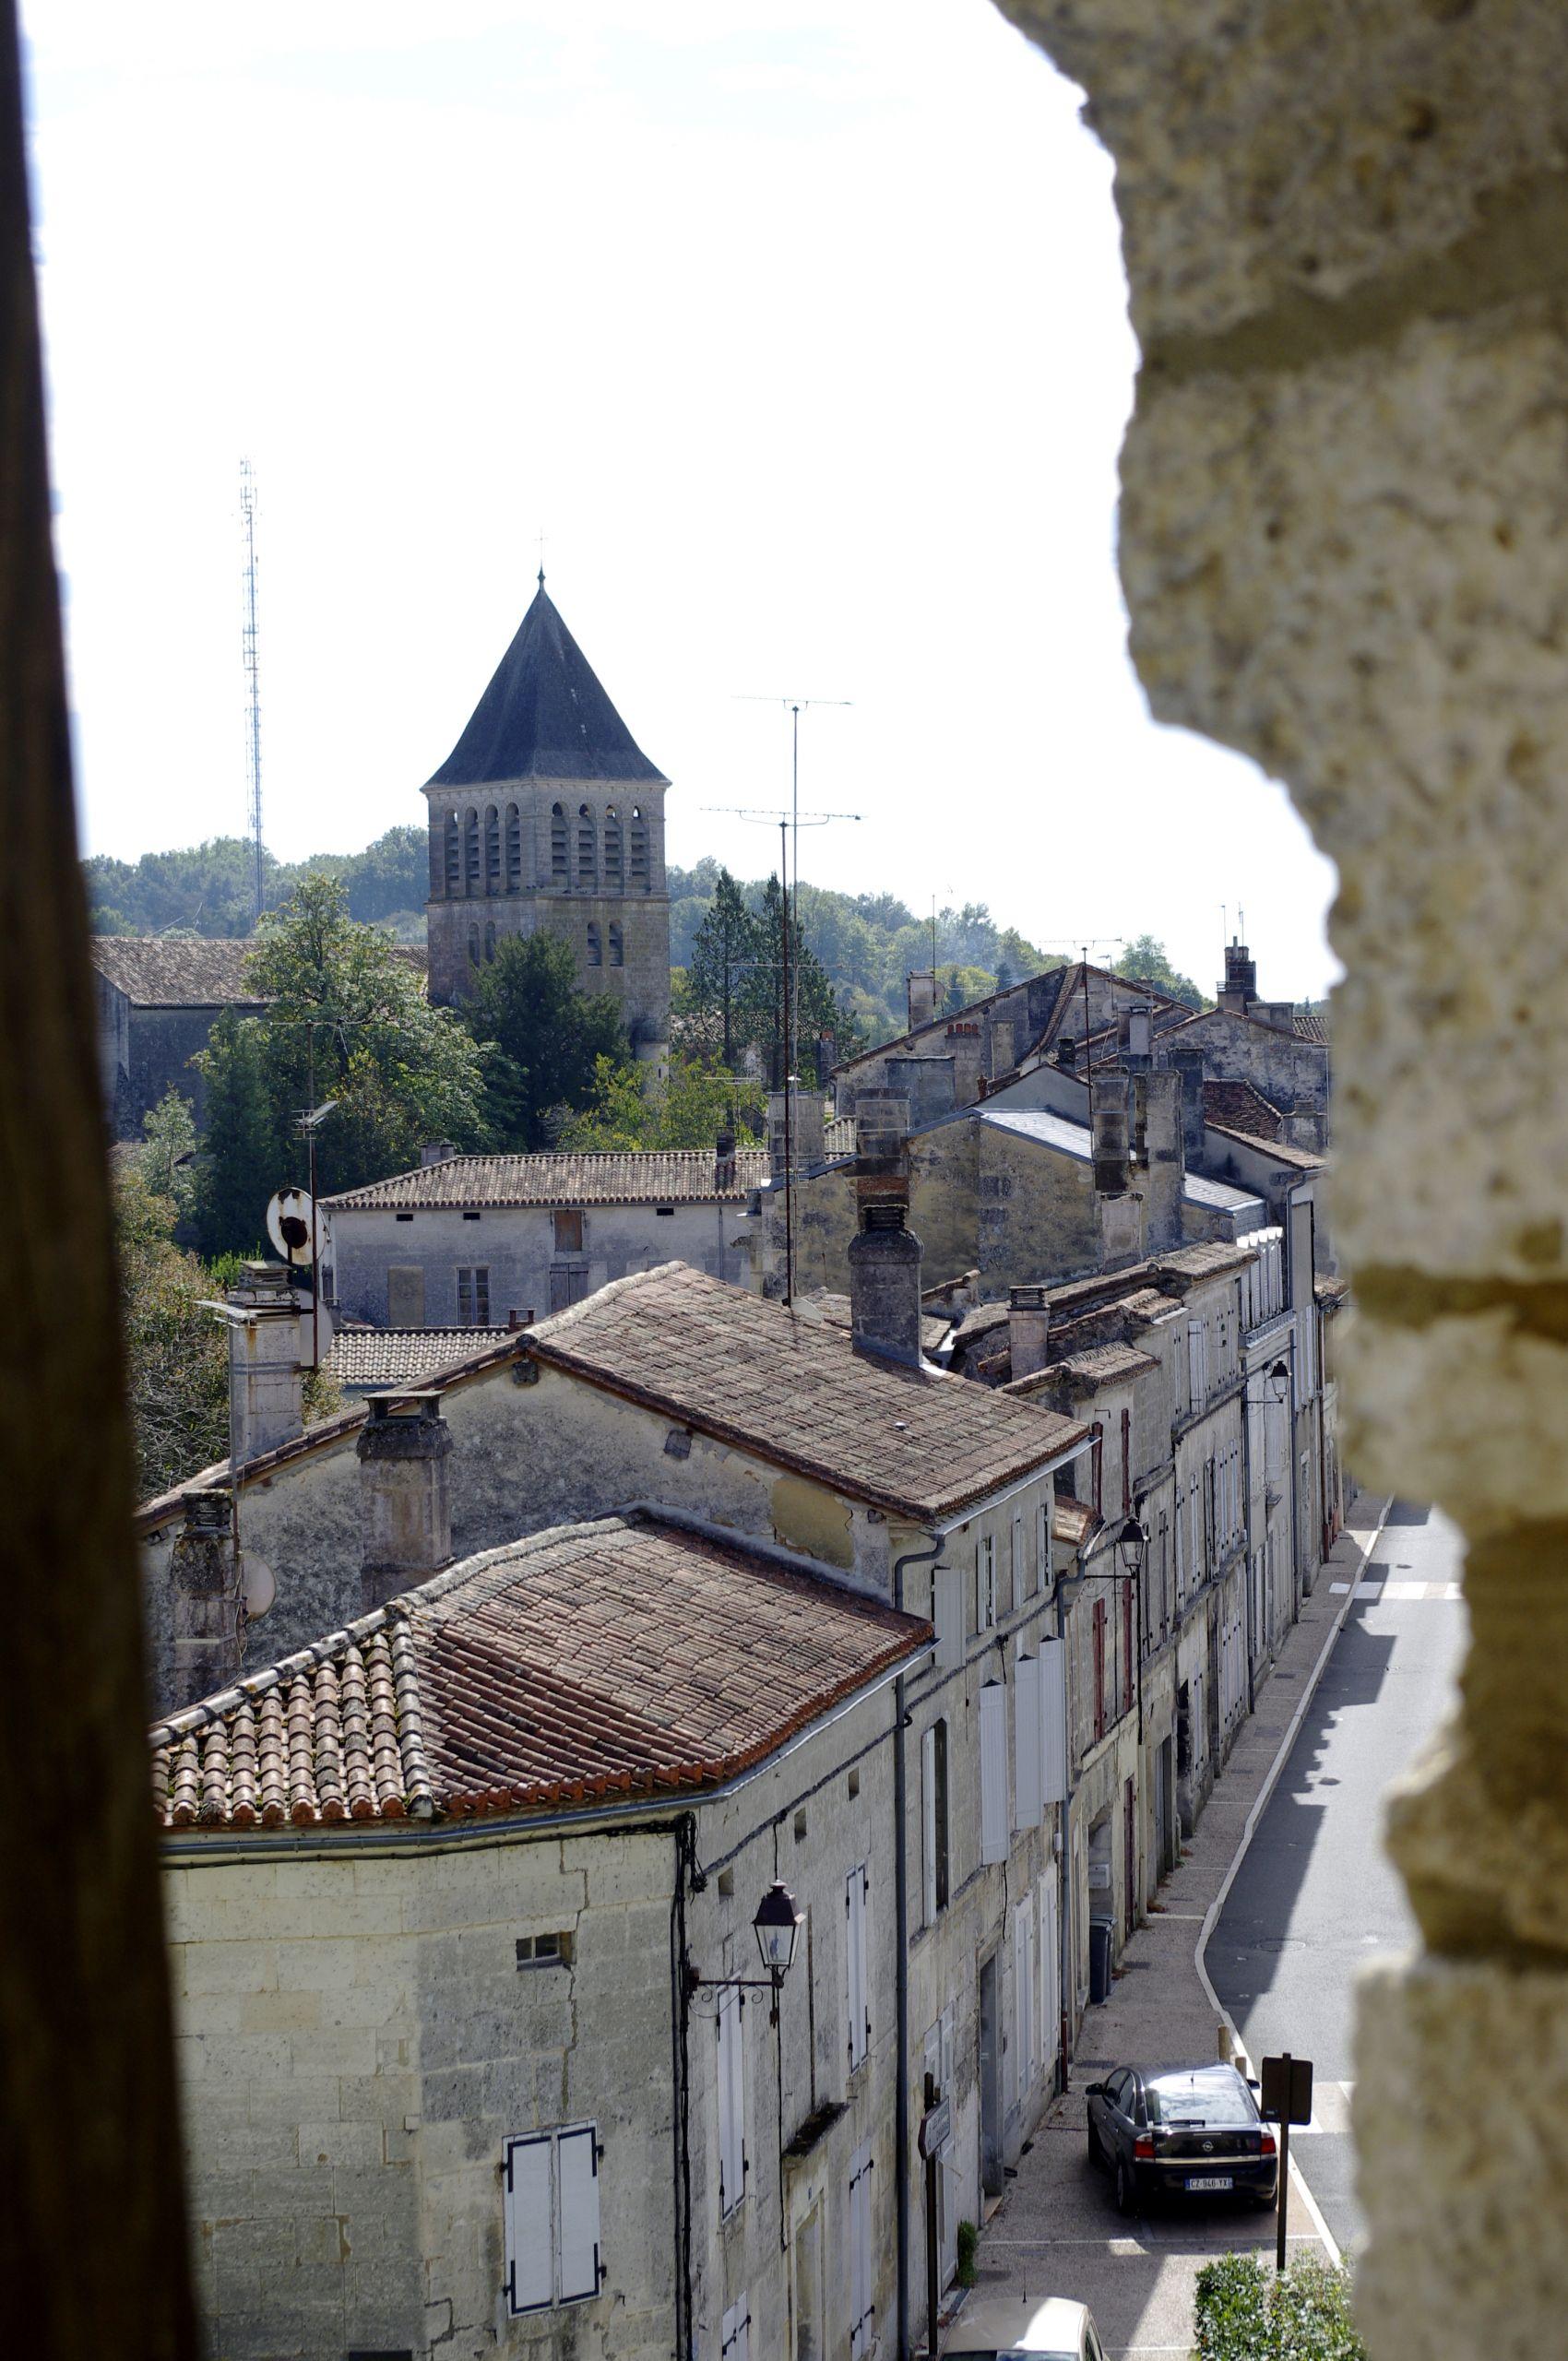 Mareuil chateau 22 JPG